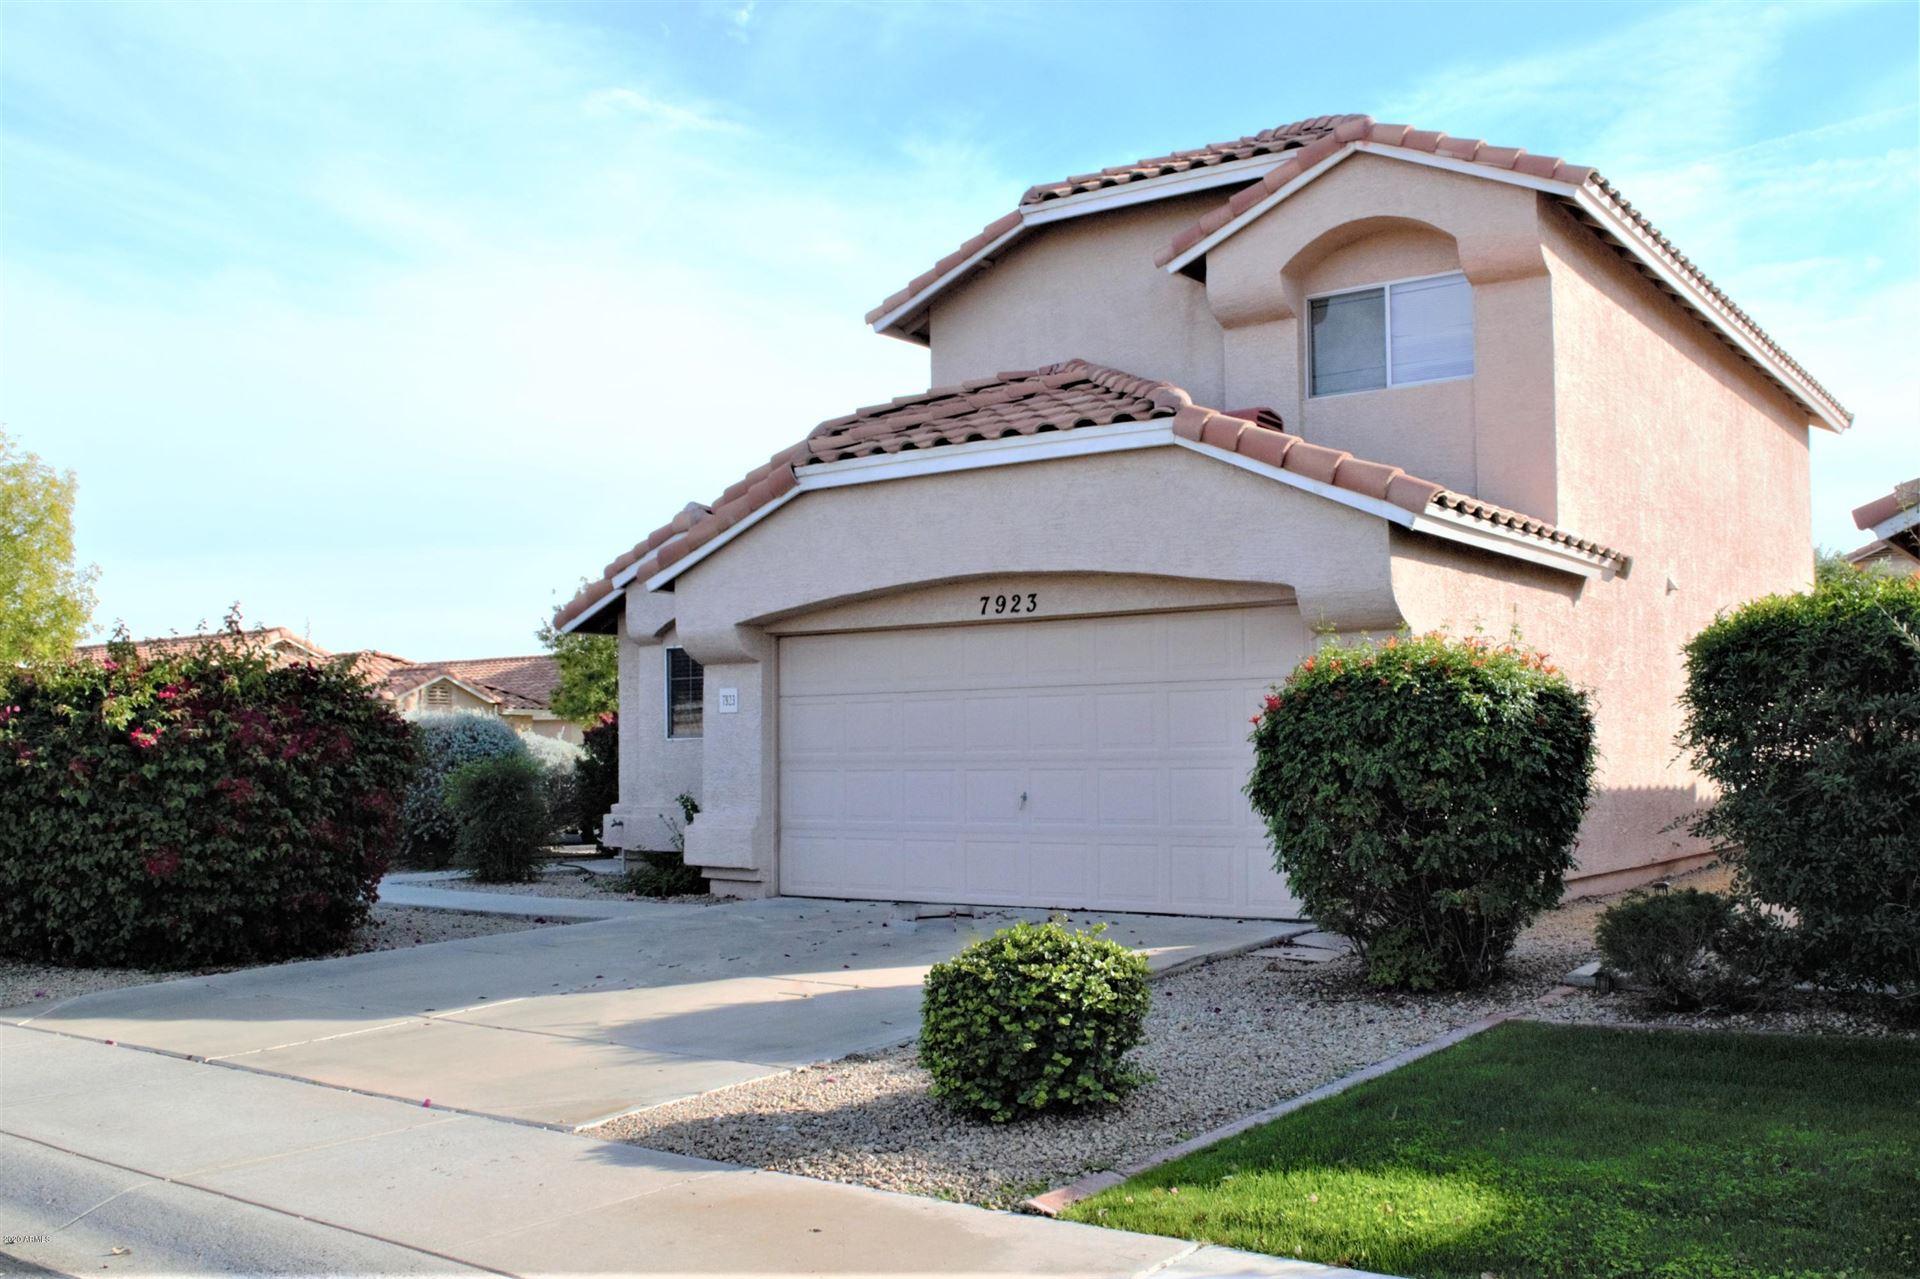 7923 W Shaw Butte Drive, Peoria, AZ 85345 - MLS#: 6133713